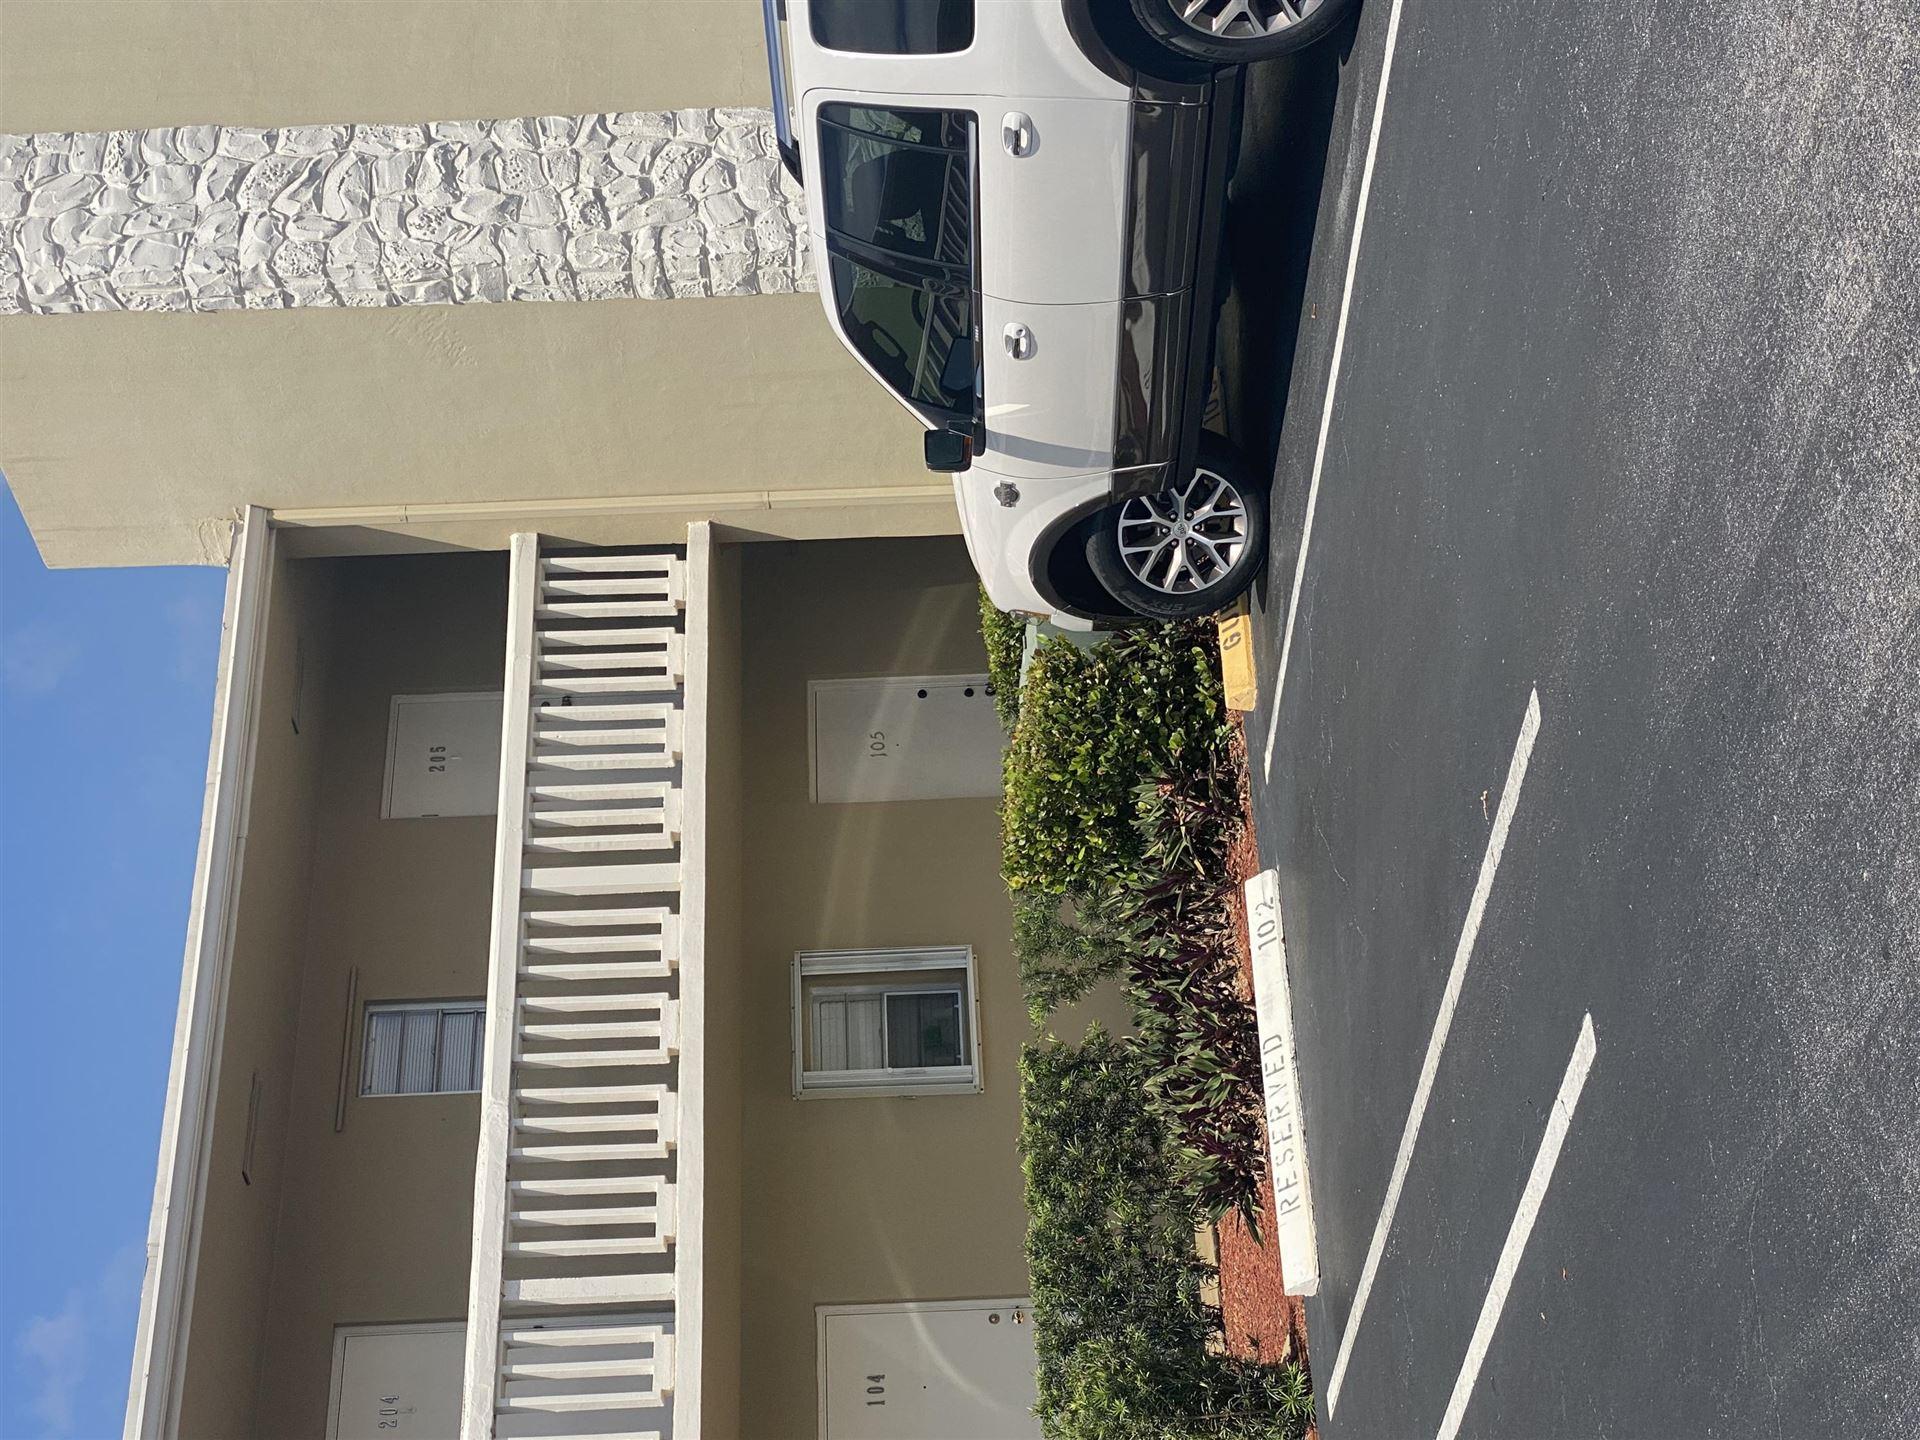 409 Us Highway 1 #105, North Palm Beach, FL 33408 - #: RX-10707583